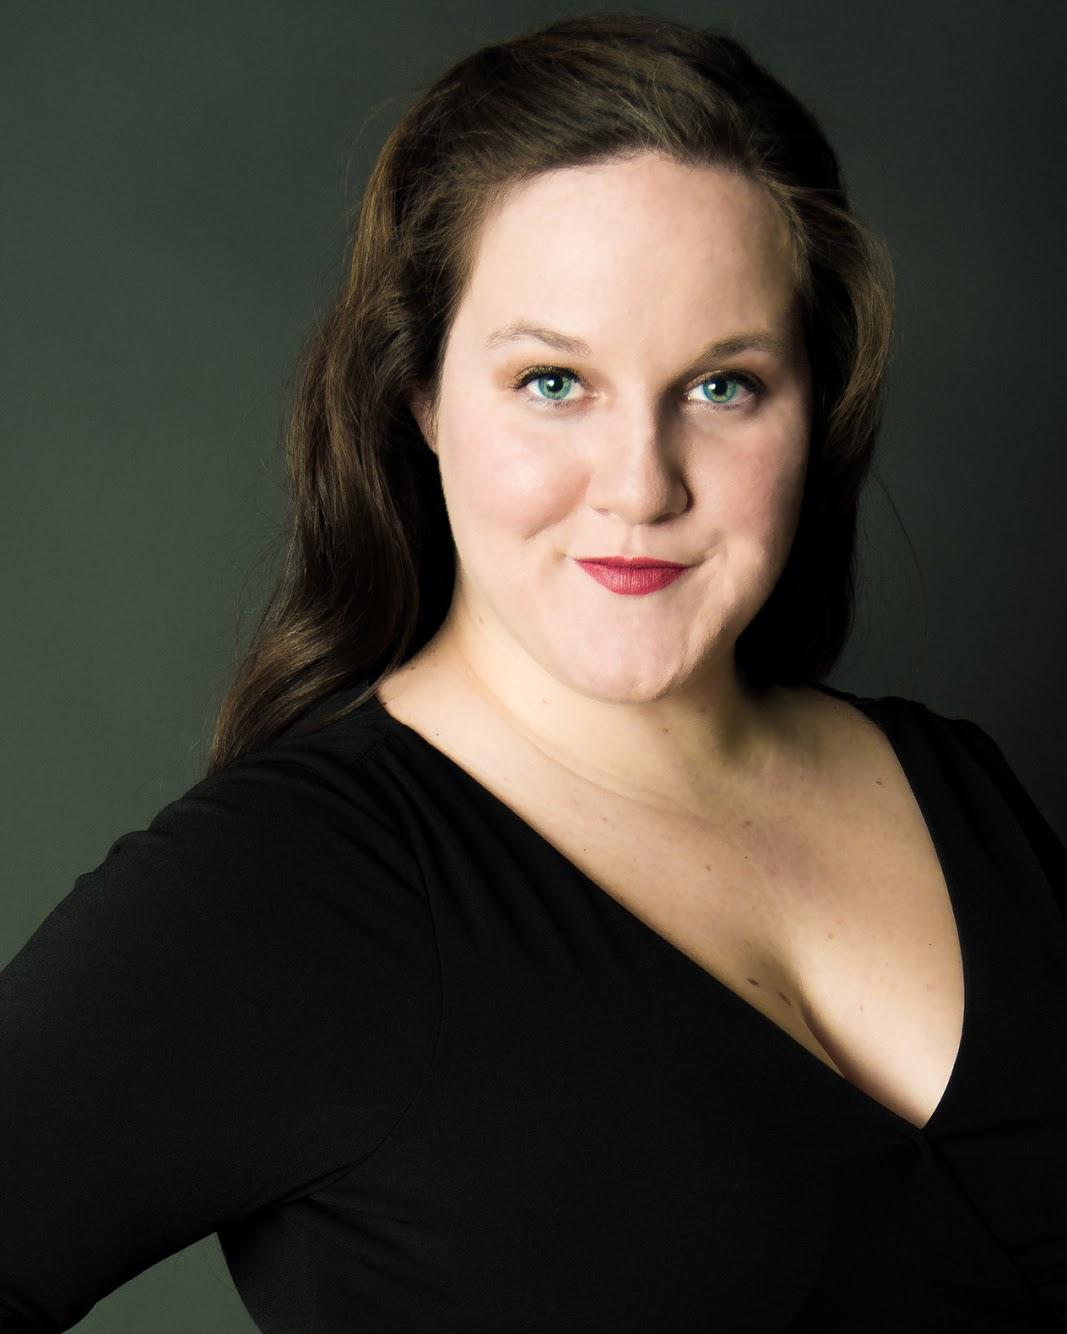 Headshot (Katie Shaw, black dress - compressed).jpg